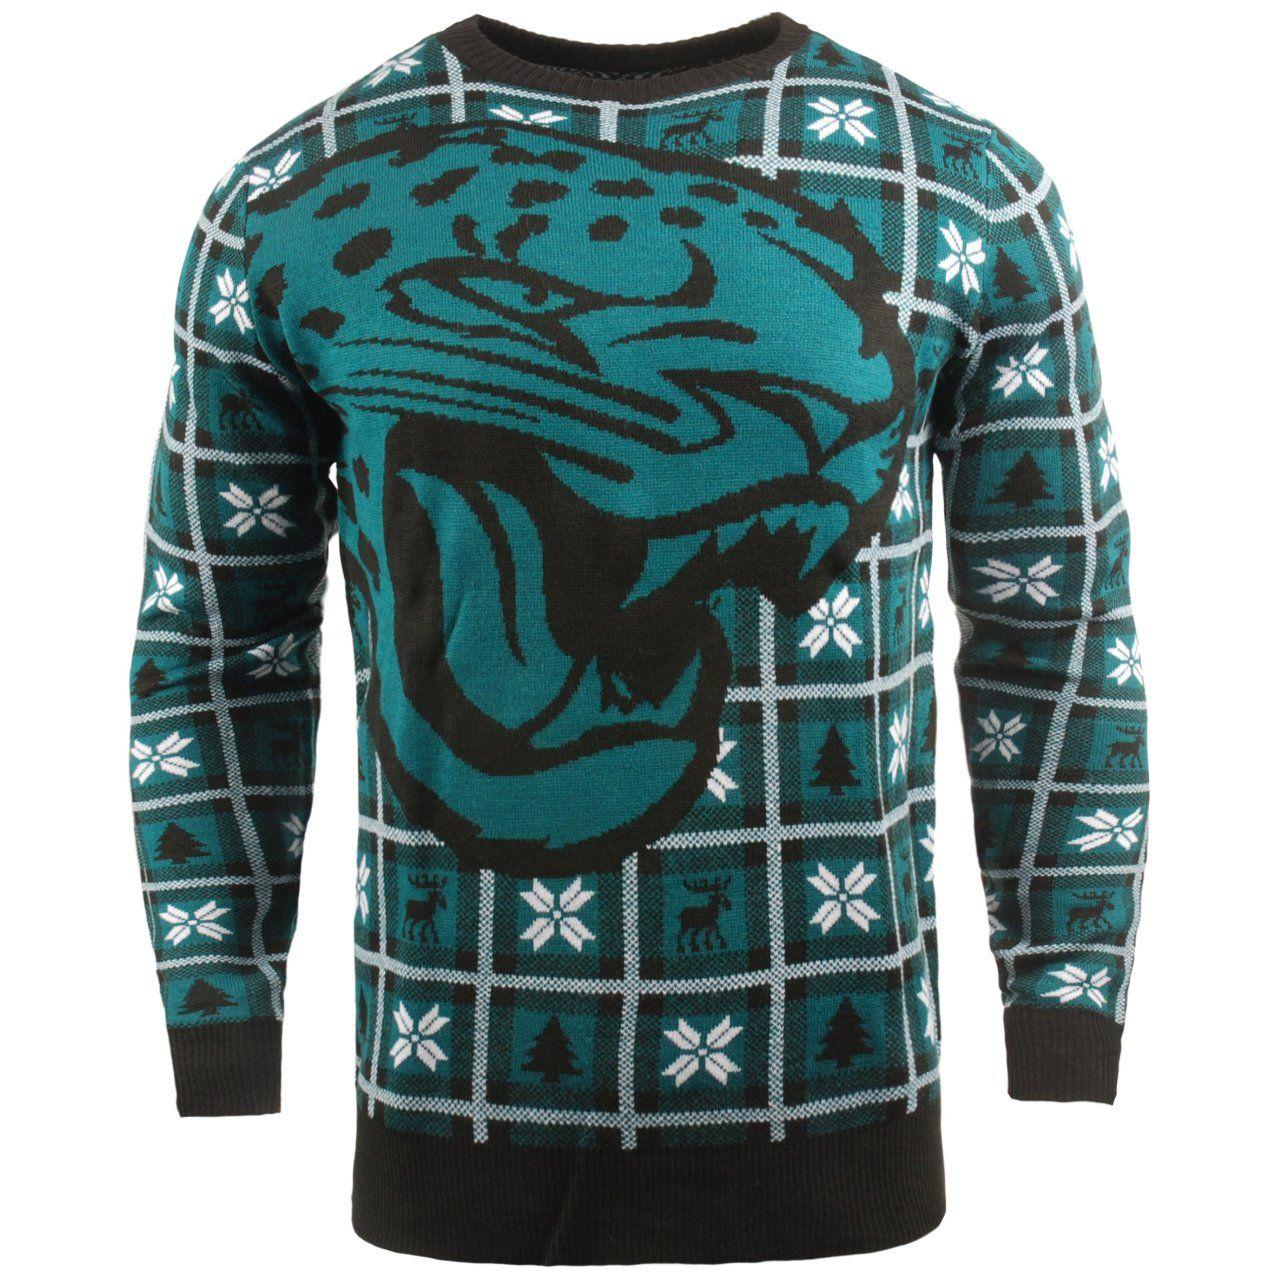 amfoo - NFL Ugly Sweater XMAS Strick Pullover - Jacksonville Jaguars